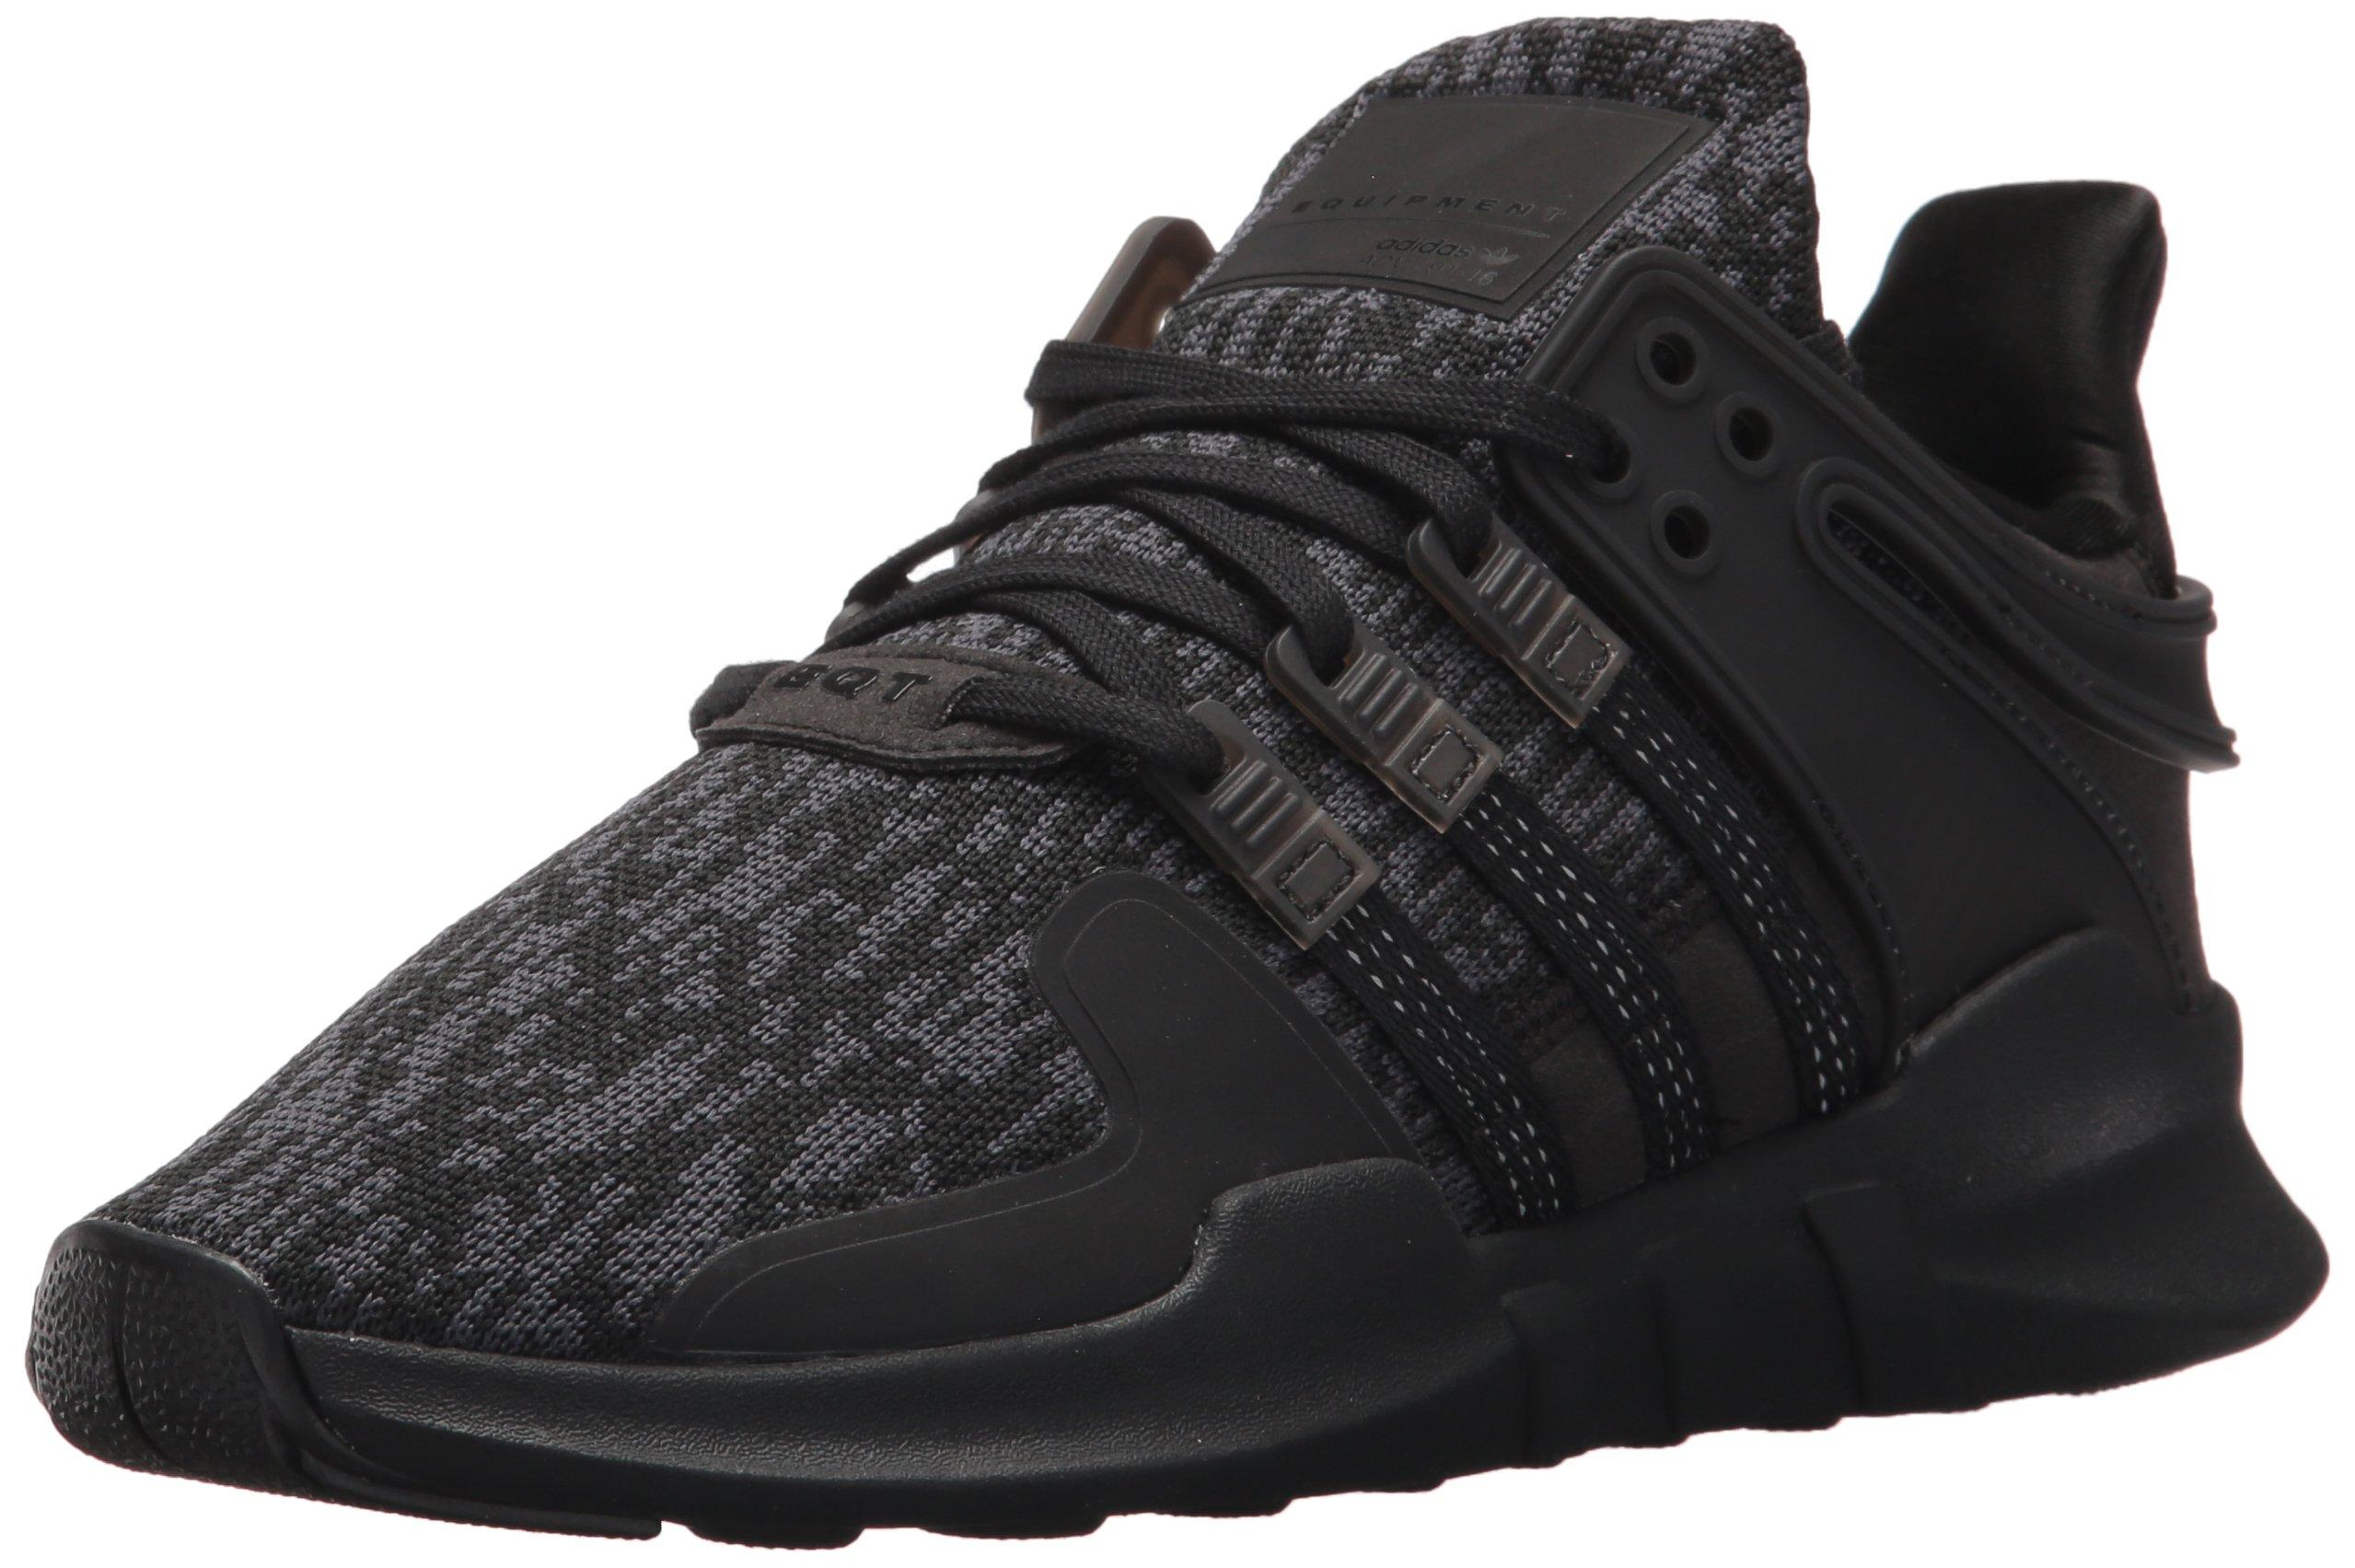 adidas Originals Boys' EQT Support ADV J Running Shoe, Black, 6.5 M US Big Kid by adidas Originals (Image #1)